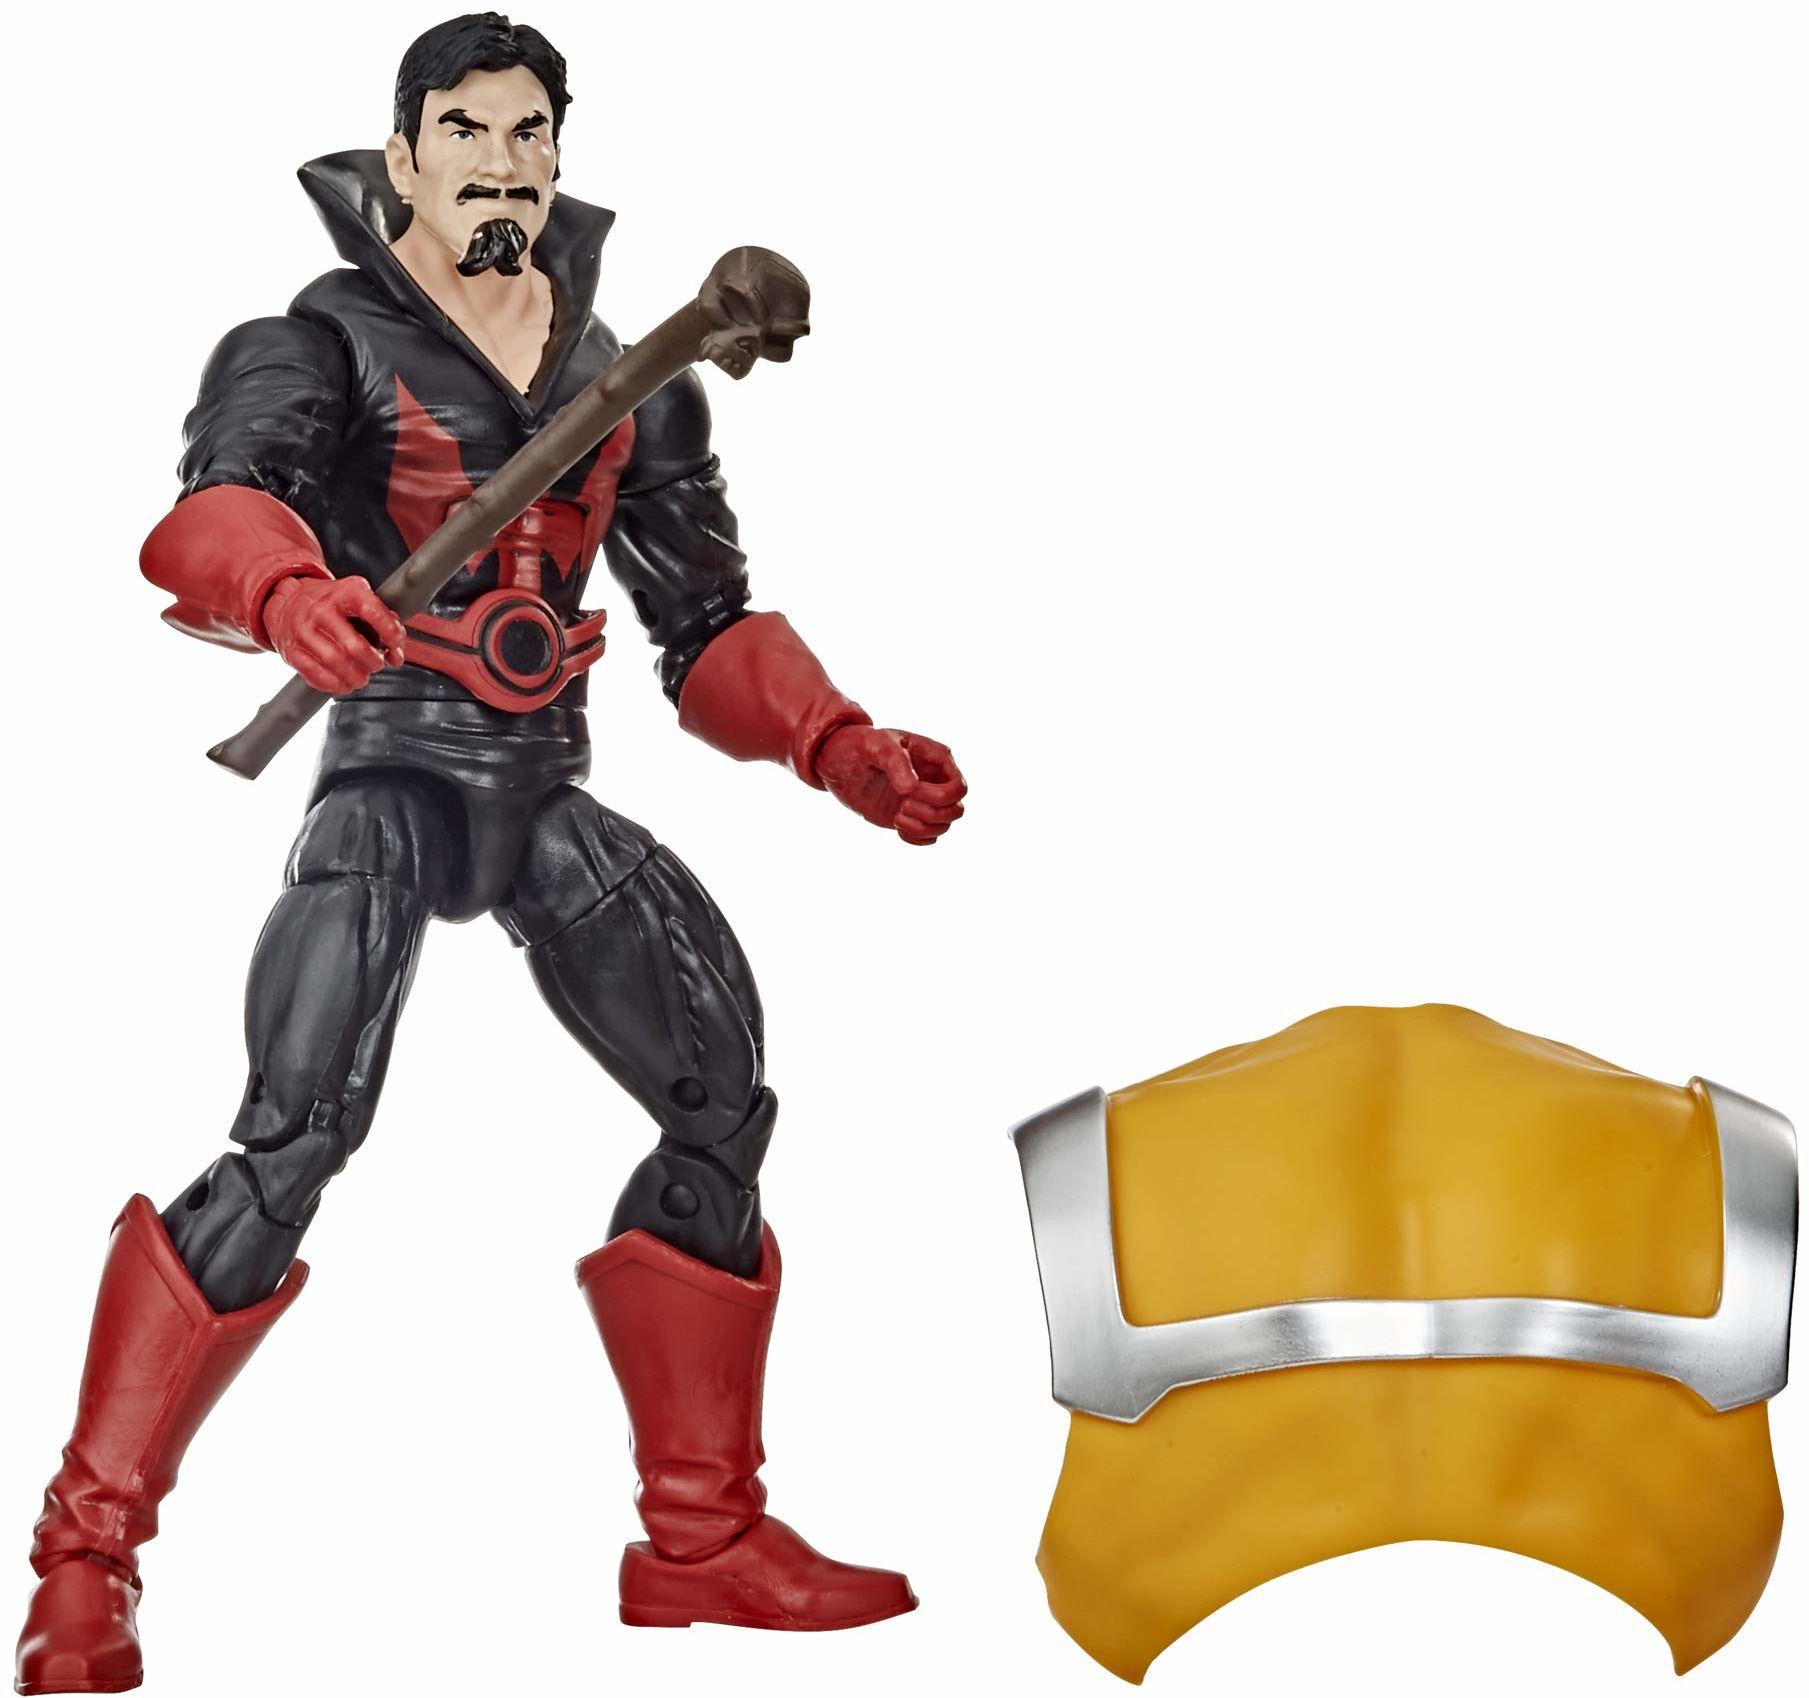 Hasbro Marvel legendy seria Deadpool kolekcja 15 cm czarna Tom Cassidy figurka zabawka design premium i 1 akcesorium